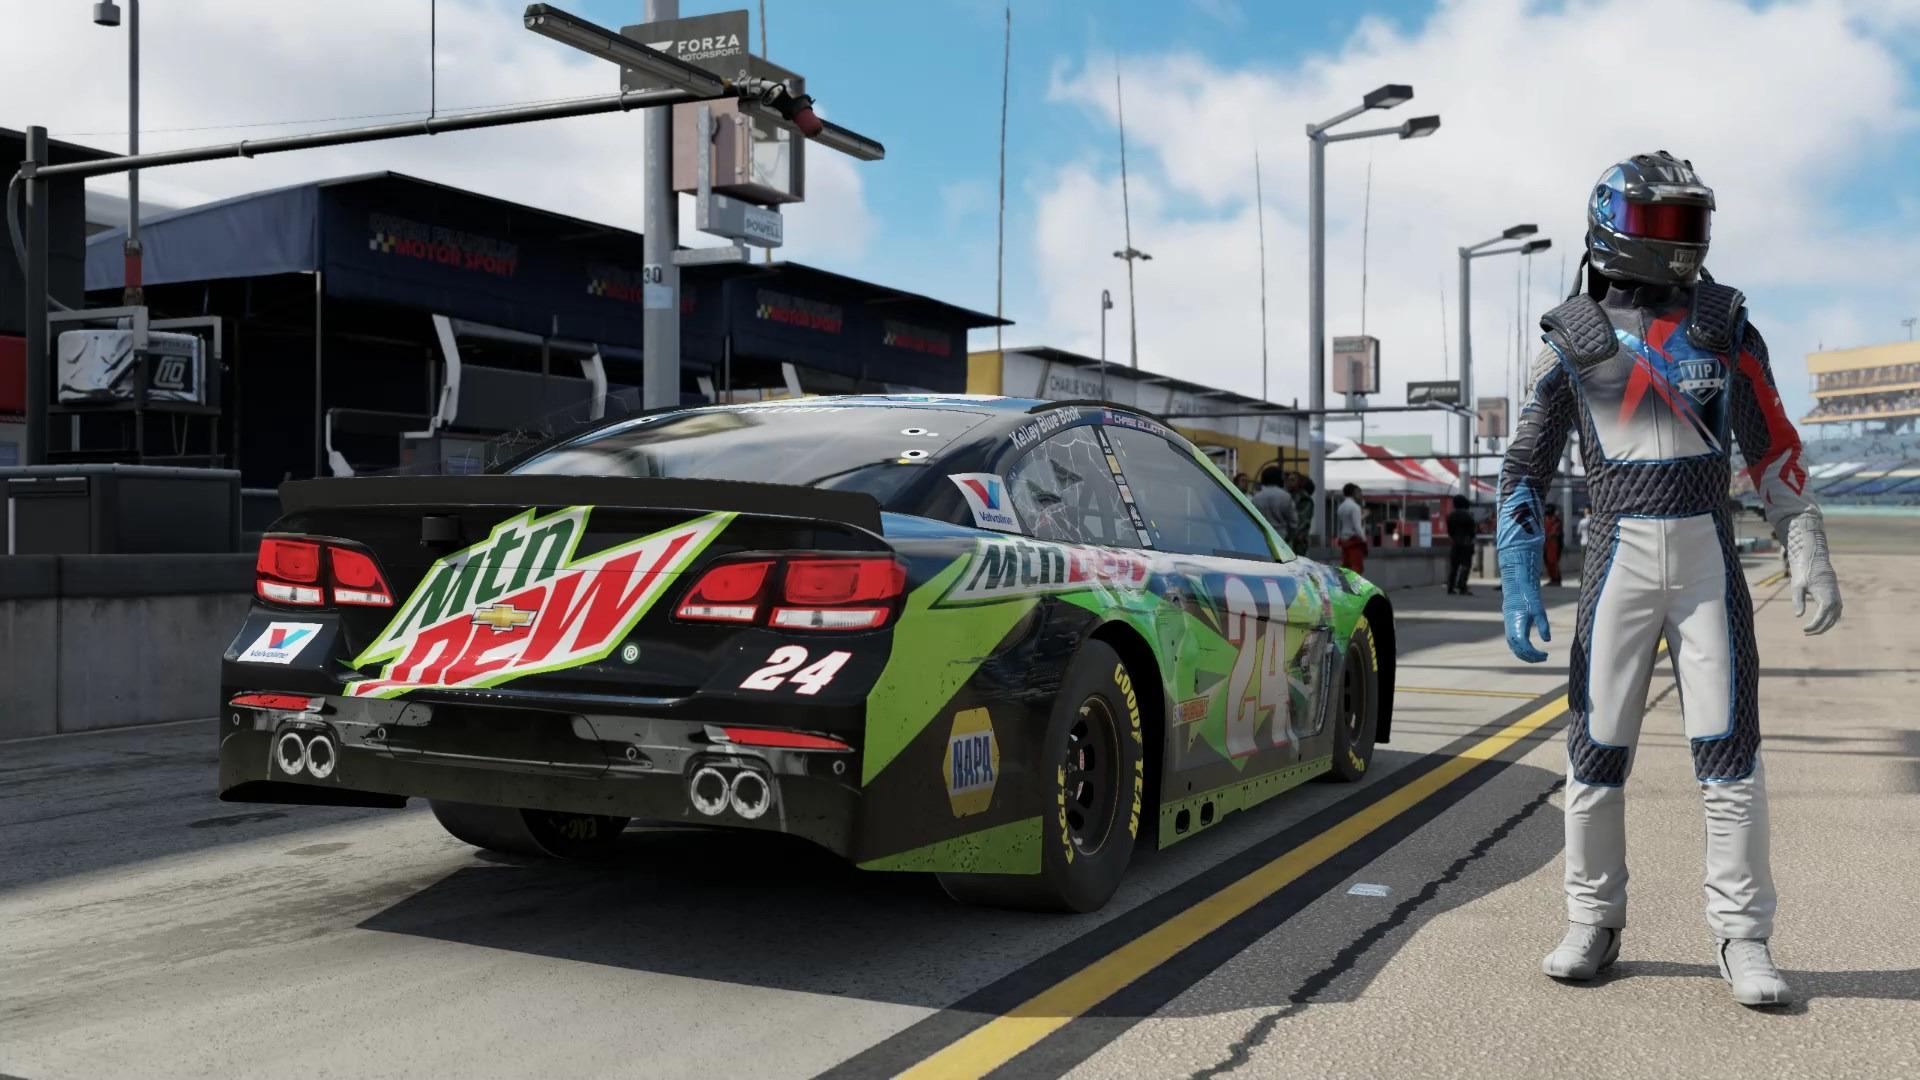 NASCAR用車両のリアライトや排気管はデカールやプリントで表現されるが、そこもバッチリ再現